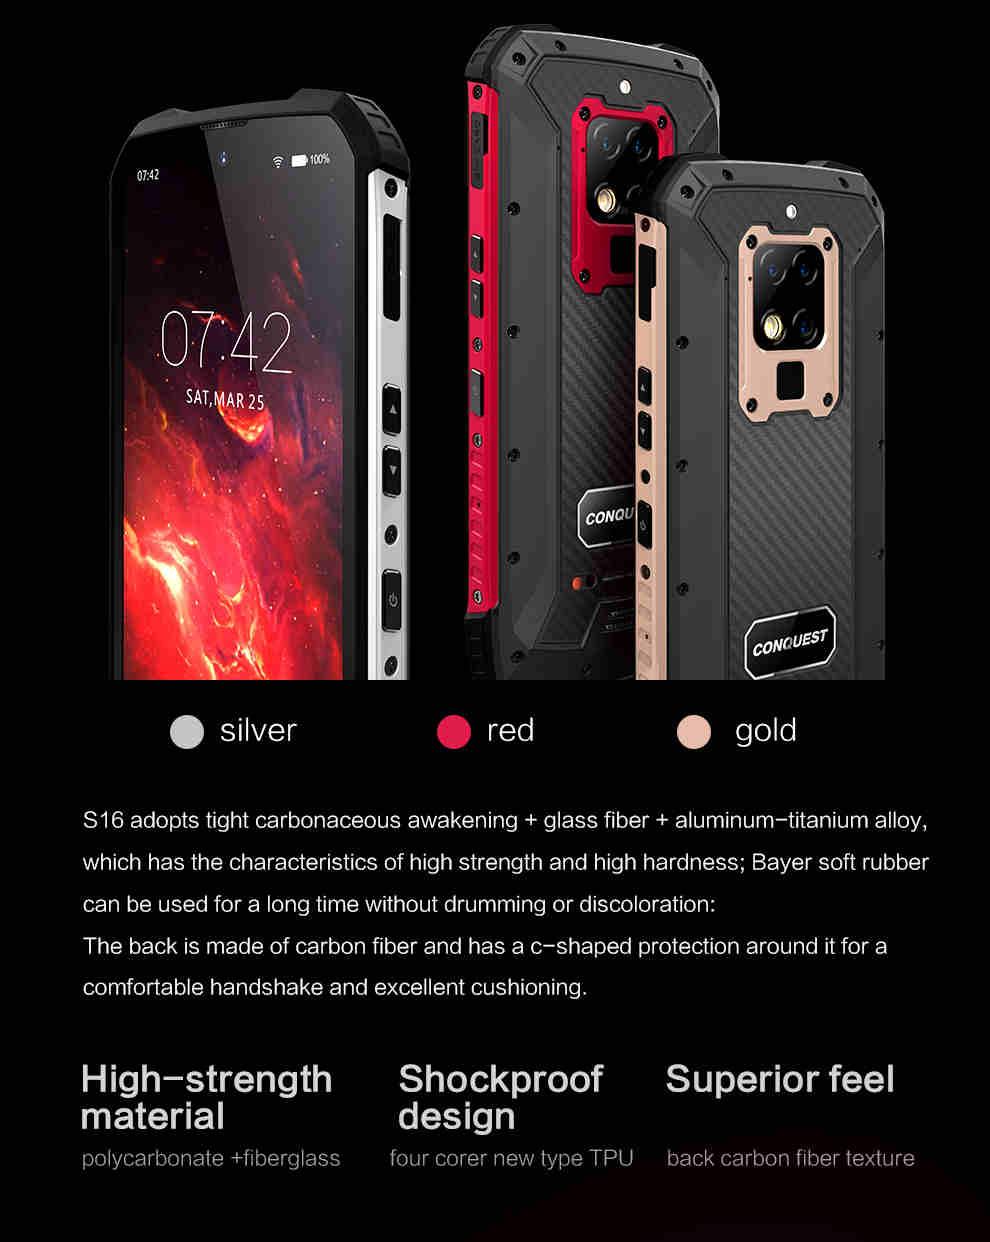 Conquest S16 ATEX Rugged Smartphone 7